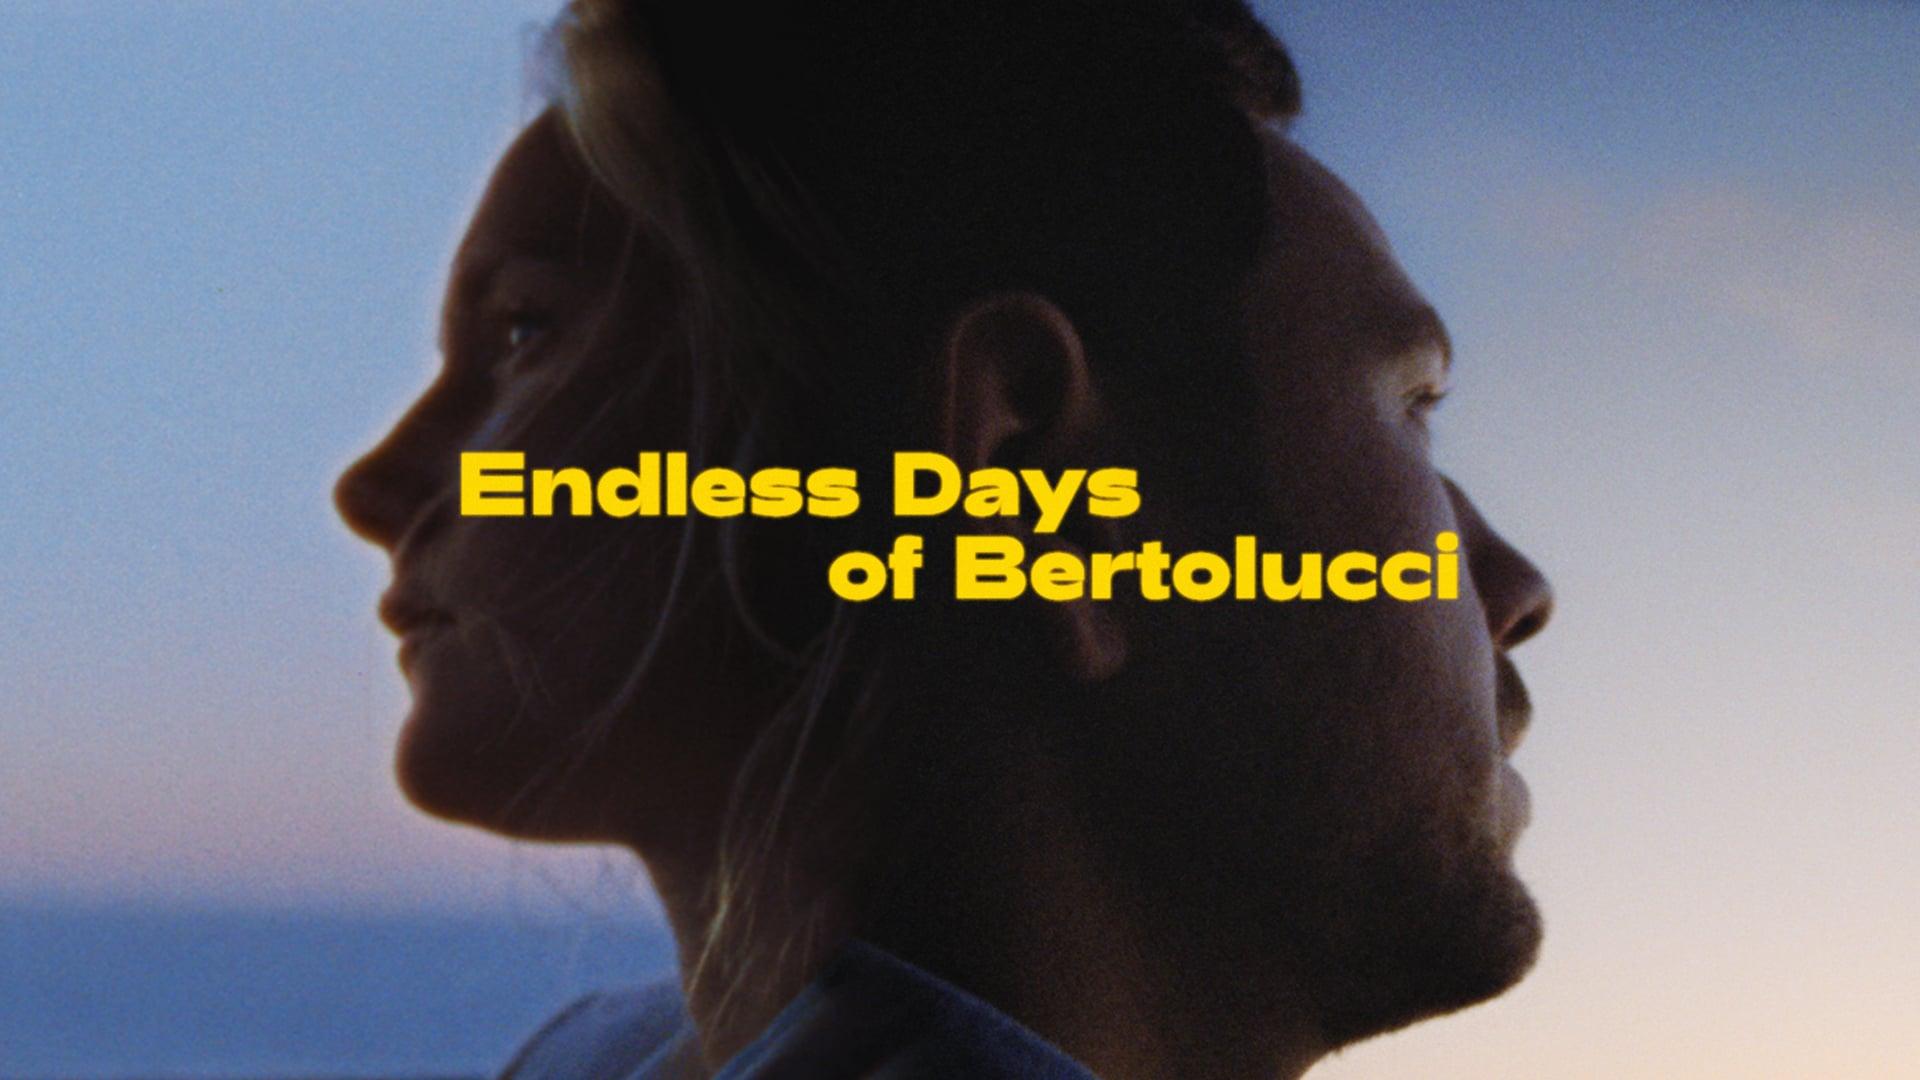 Endless Days of Bertolucci